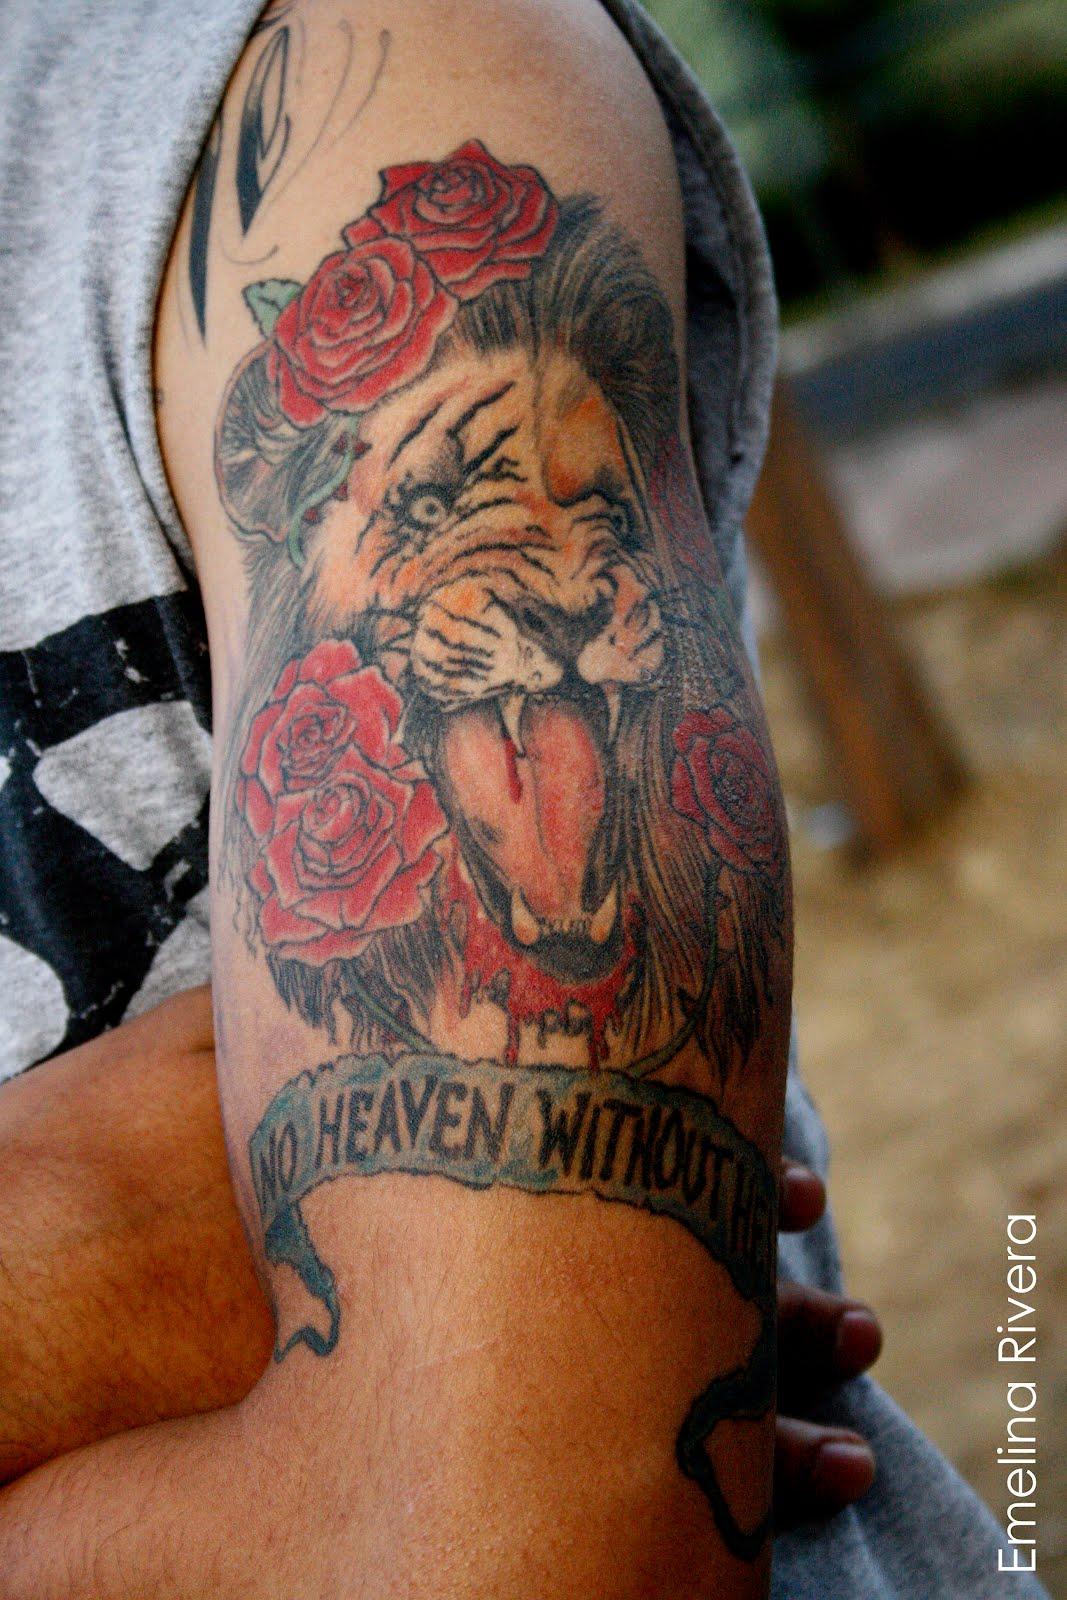 Fotografia Documental Y Mas Primer Documental Tema Tatuajes